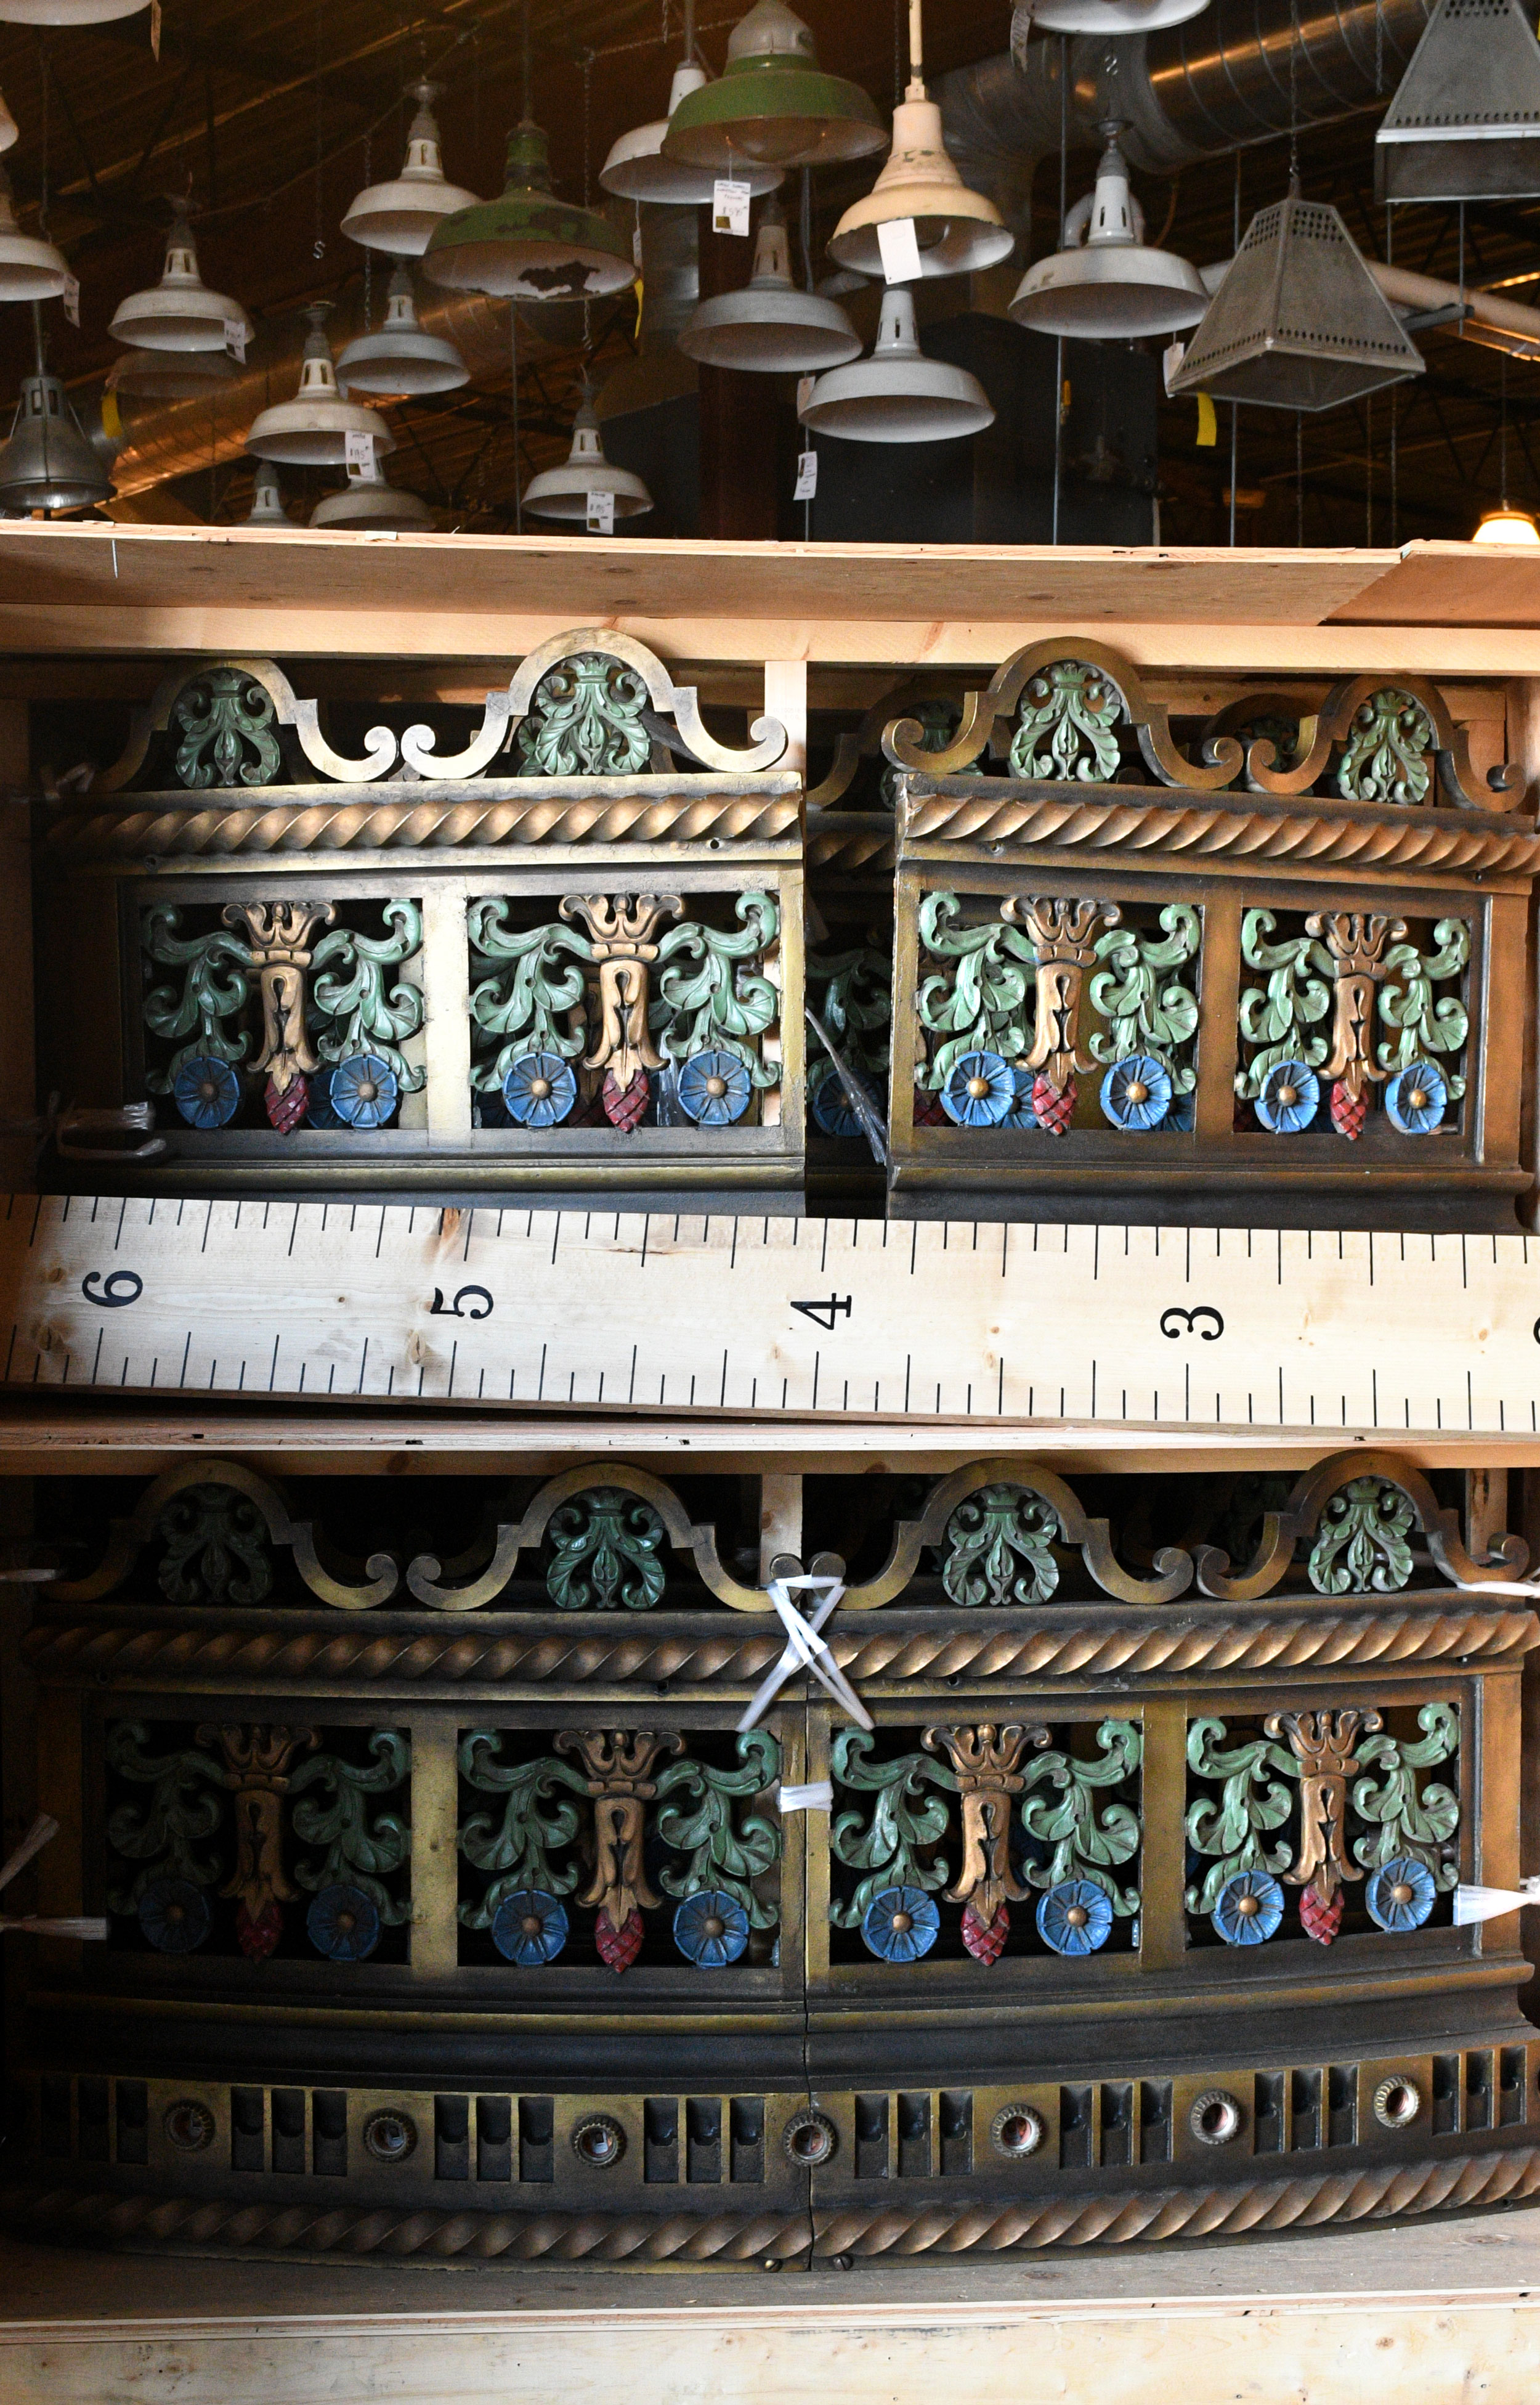 47783-massive-12-ft-chandelier-panel-crate-measuring-stick.jpg